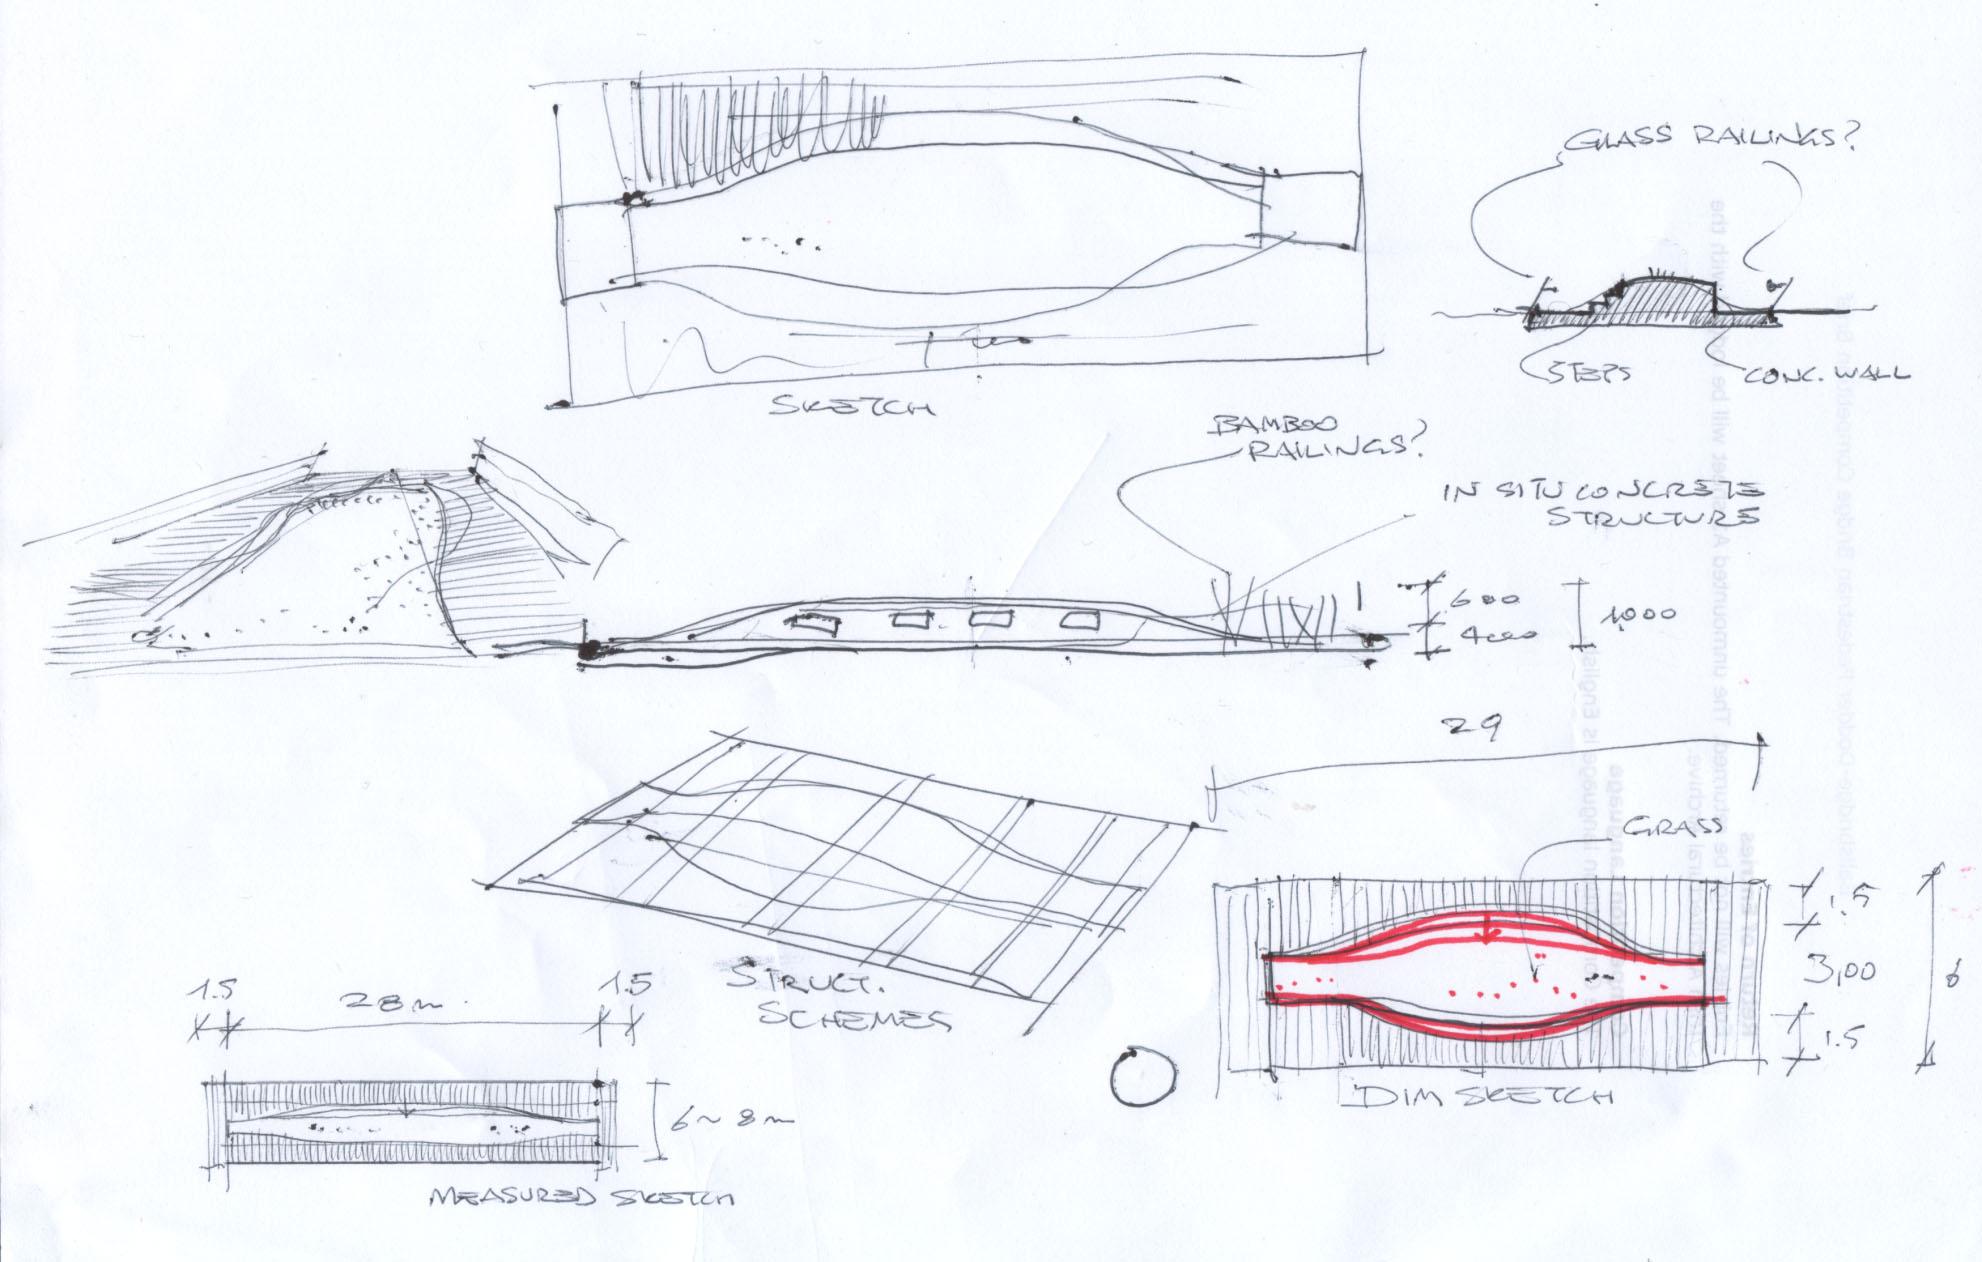 bridge sketch 24 june